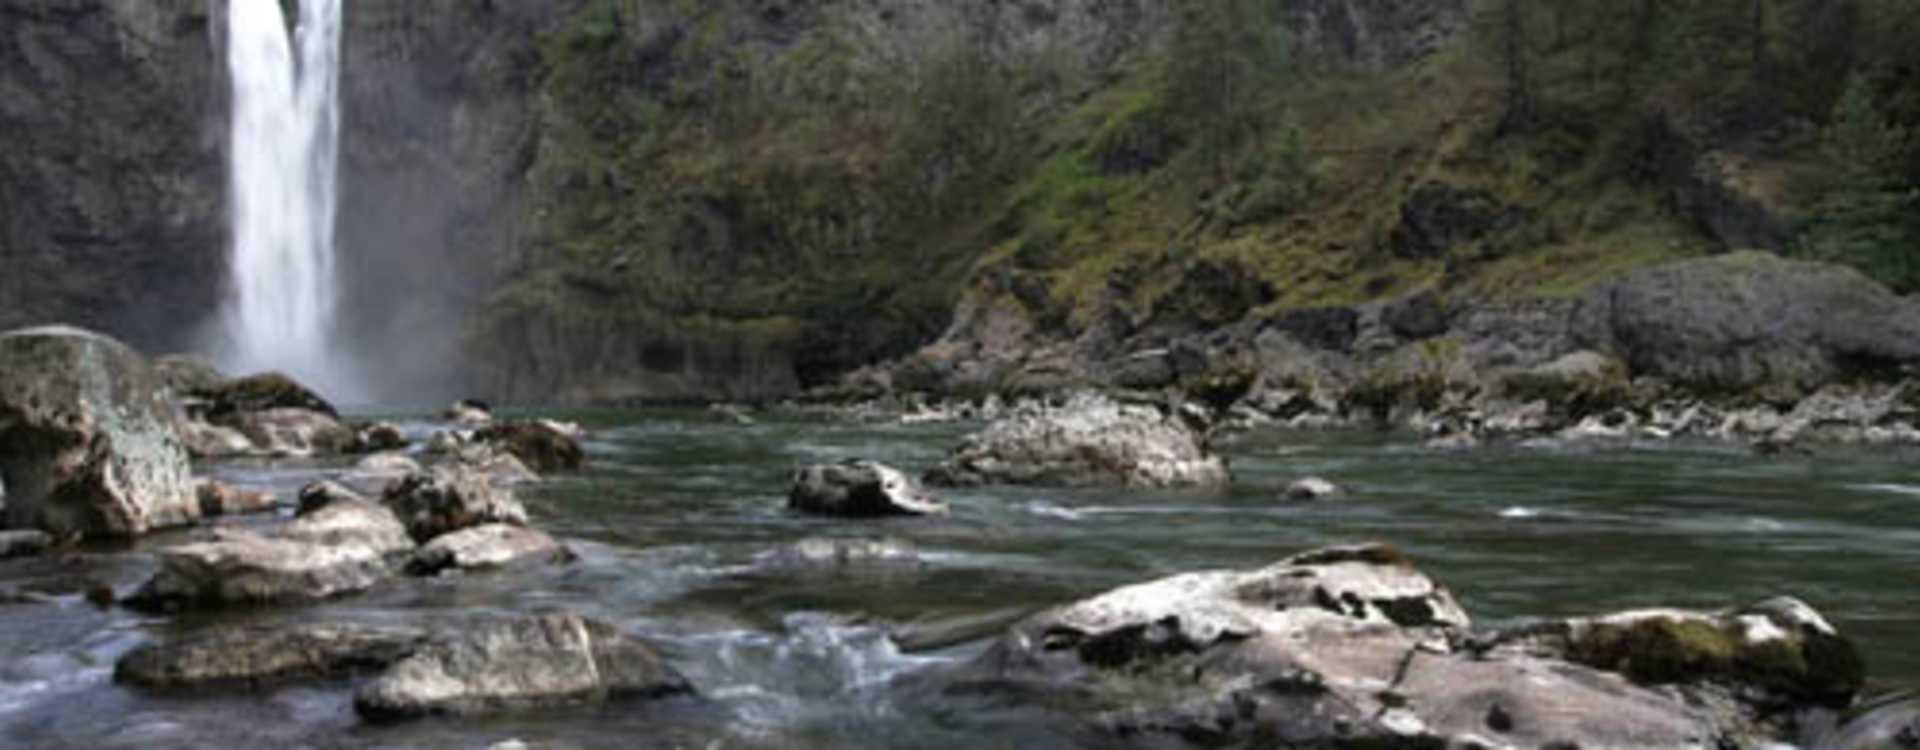 Snoqualmie_Falls-2.jpg